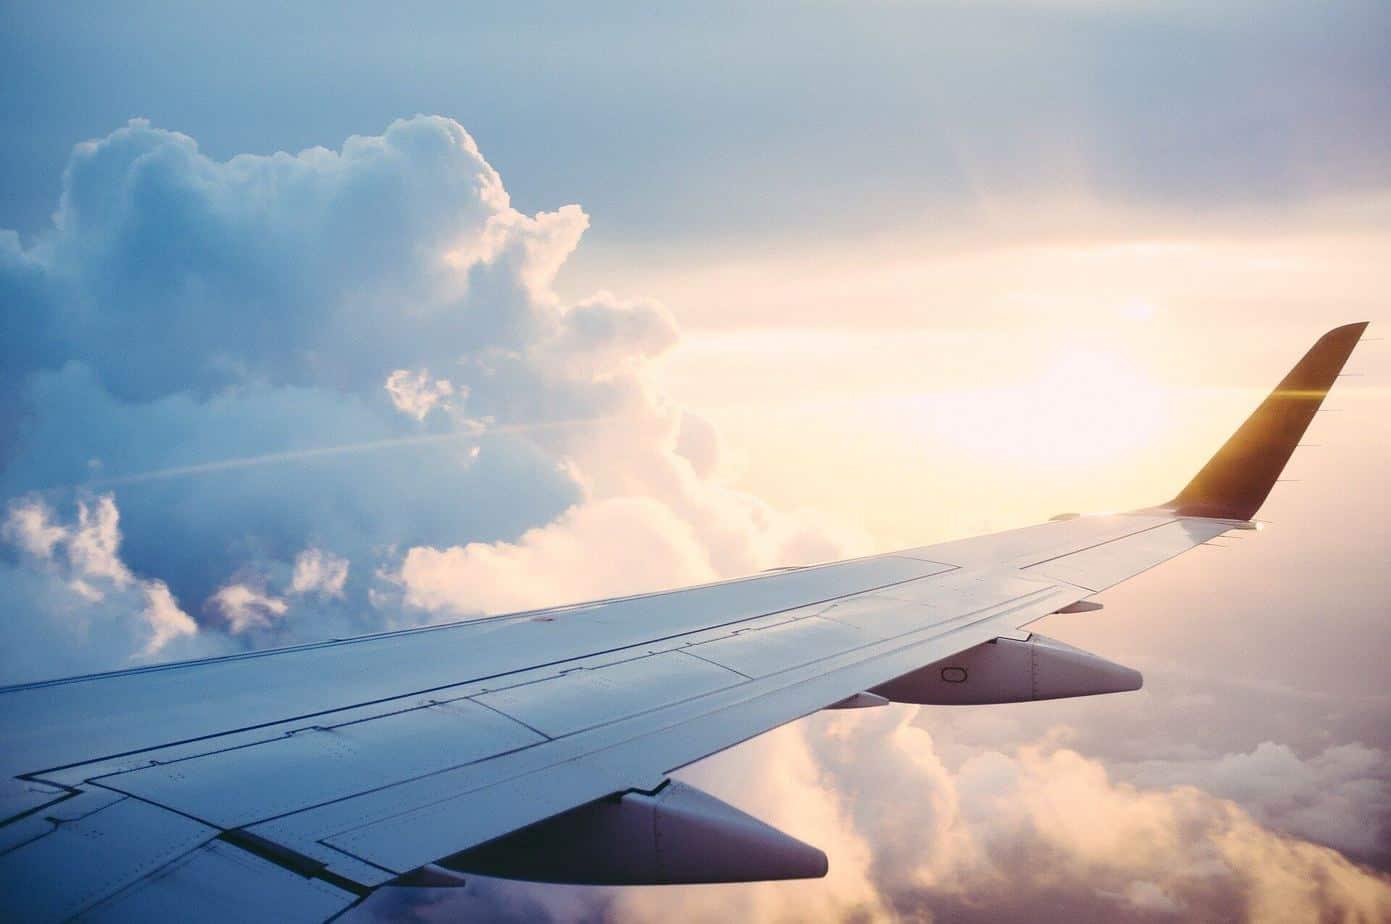 imagen viaje avión